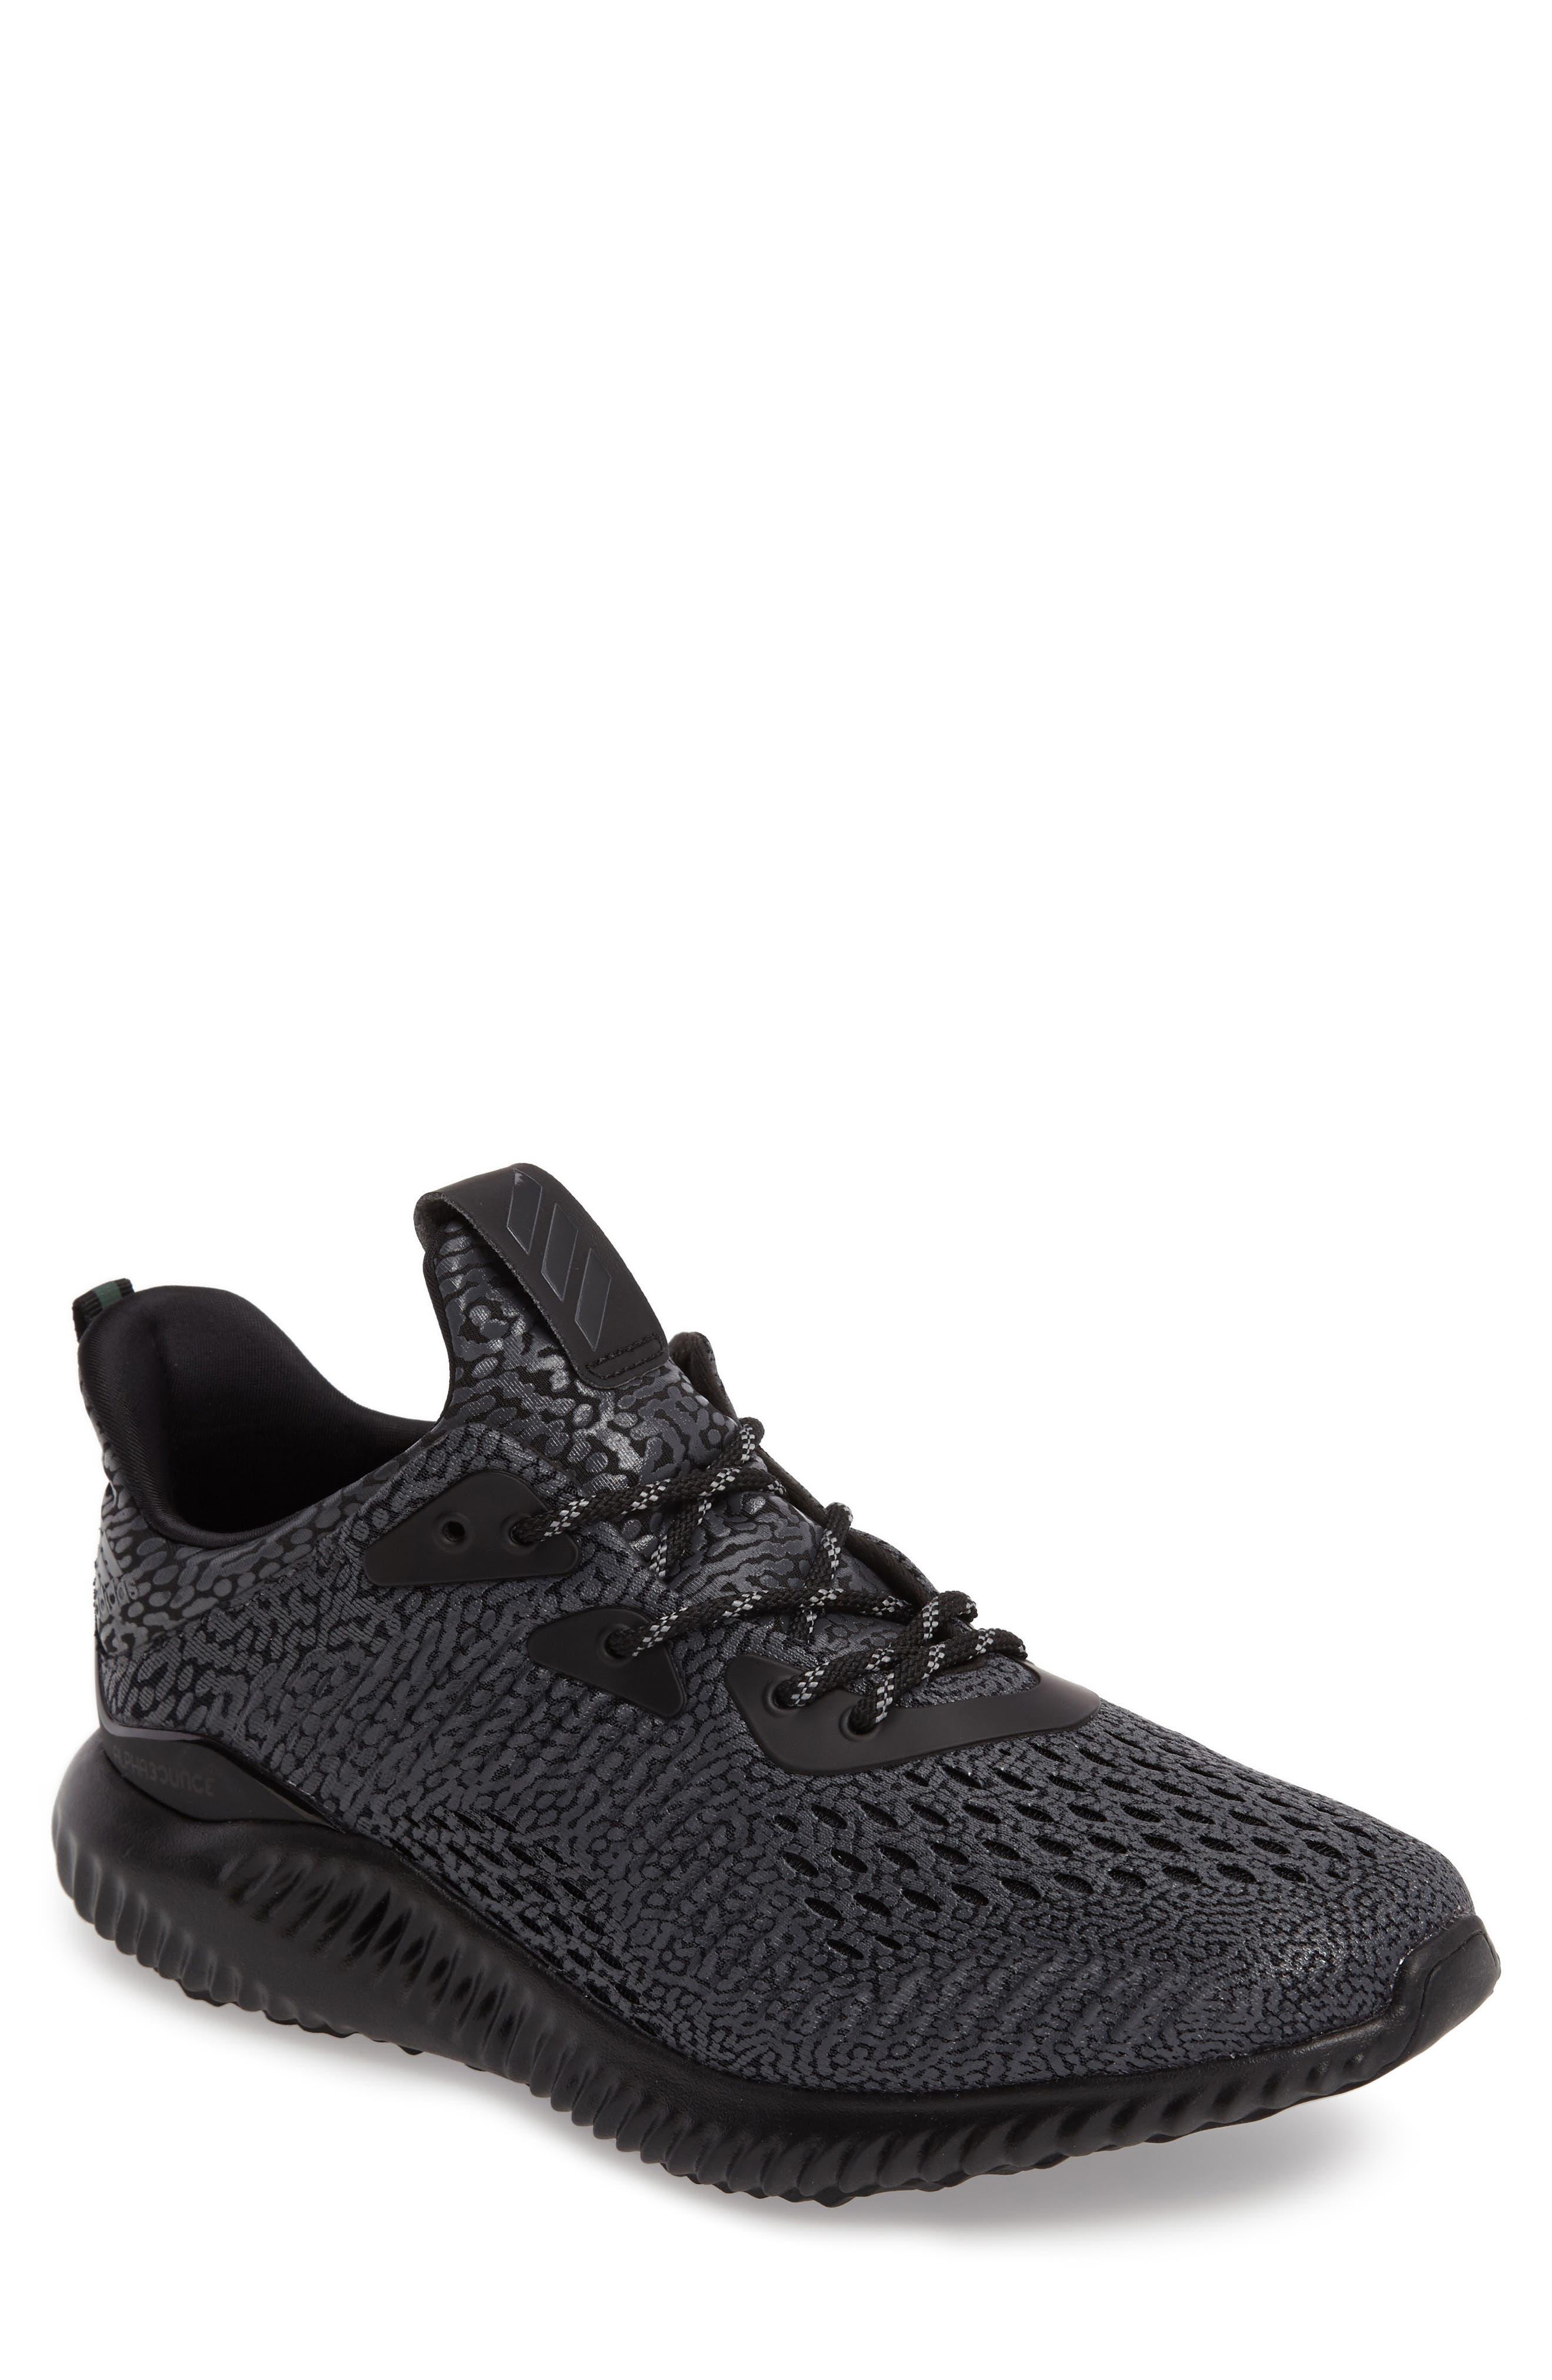 adidas Alphabounce Aramis Sneaker (Men) (Regular Retail Price: $109.95)